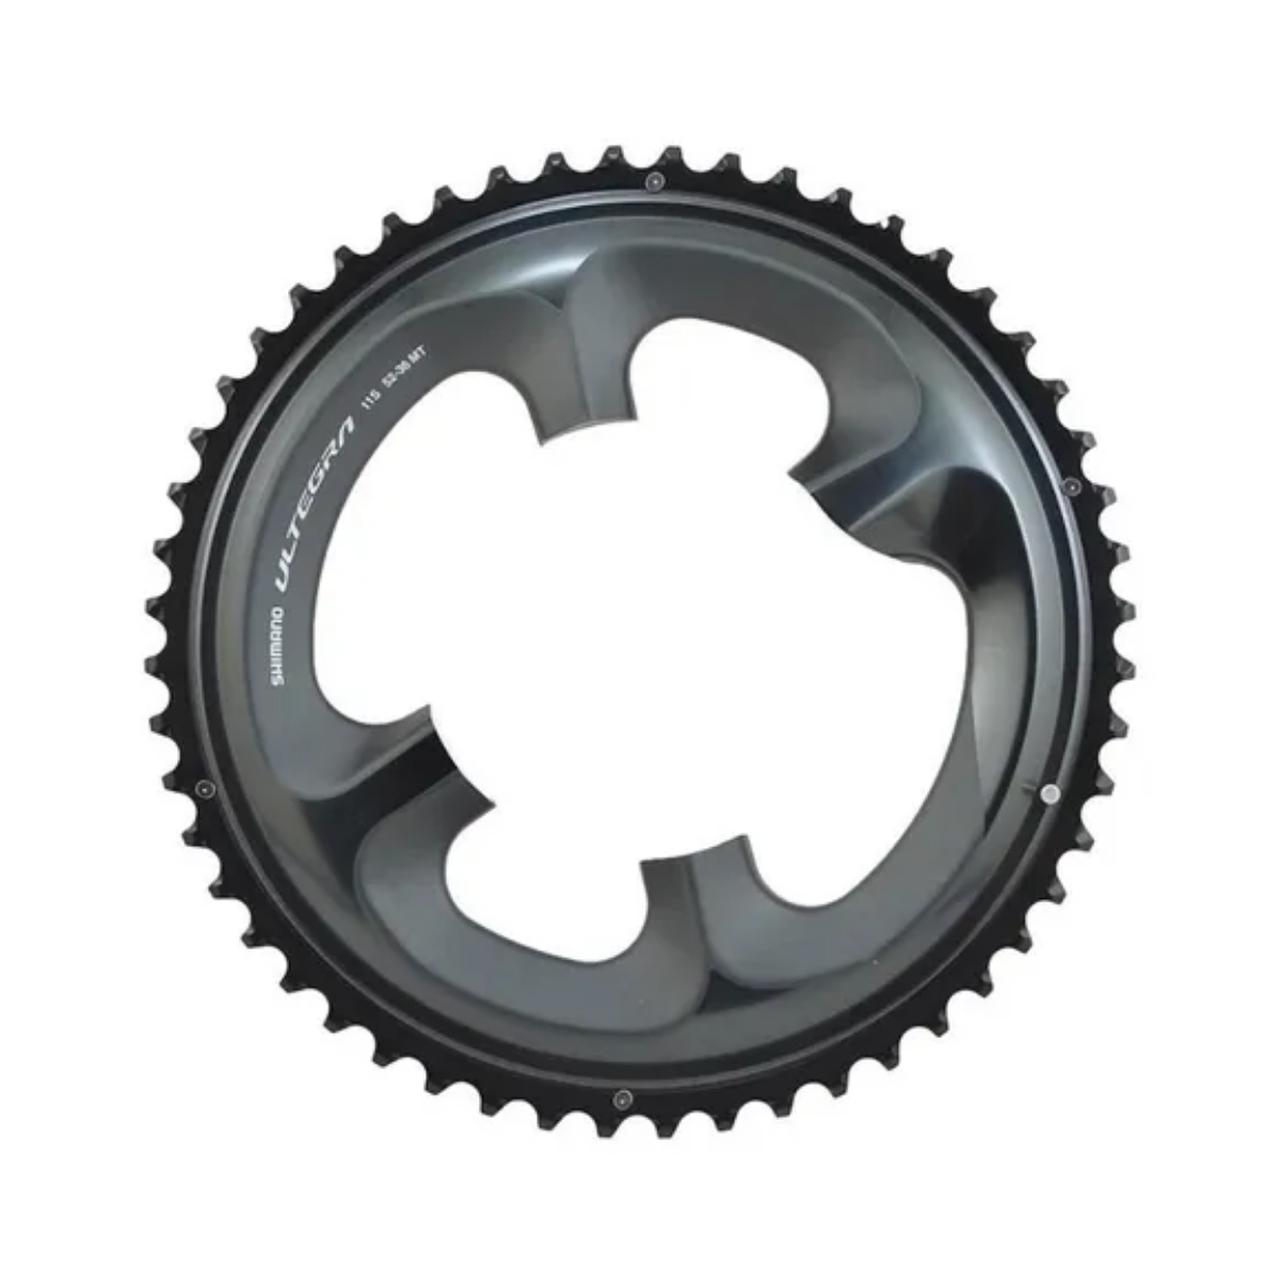 Coroa Engrenagem Diant. Shimano Ultegra FC-R8000 52D 52/36D